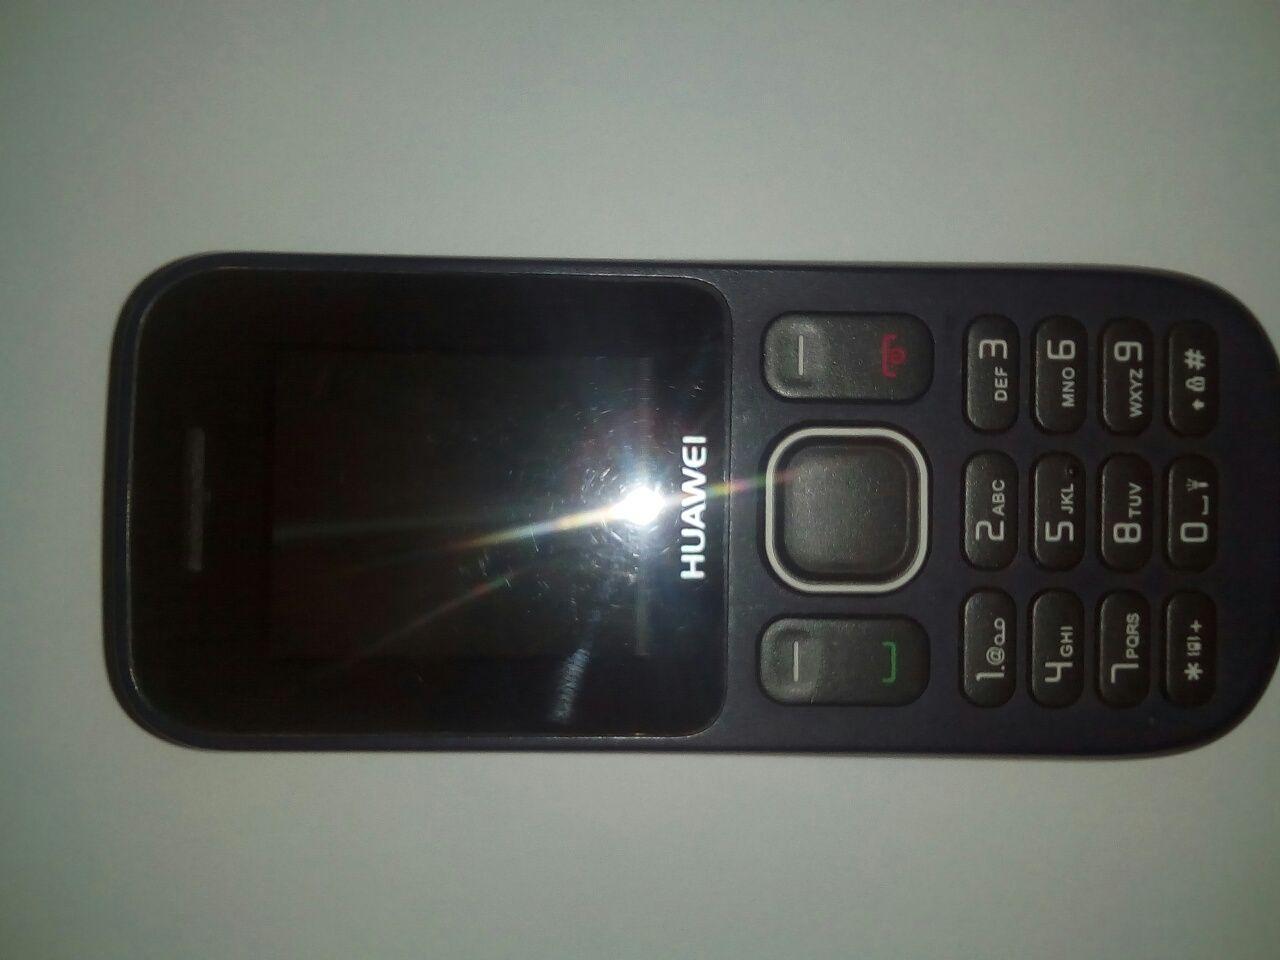 Vand telefon Huawei 3g, deblocat retea